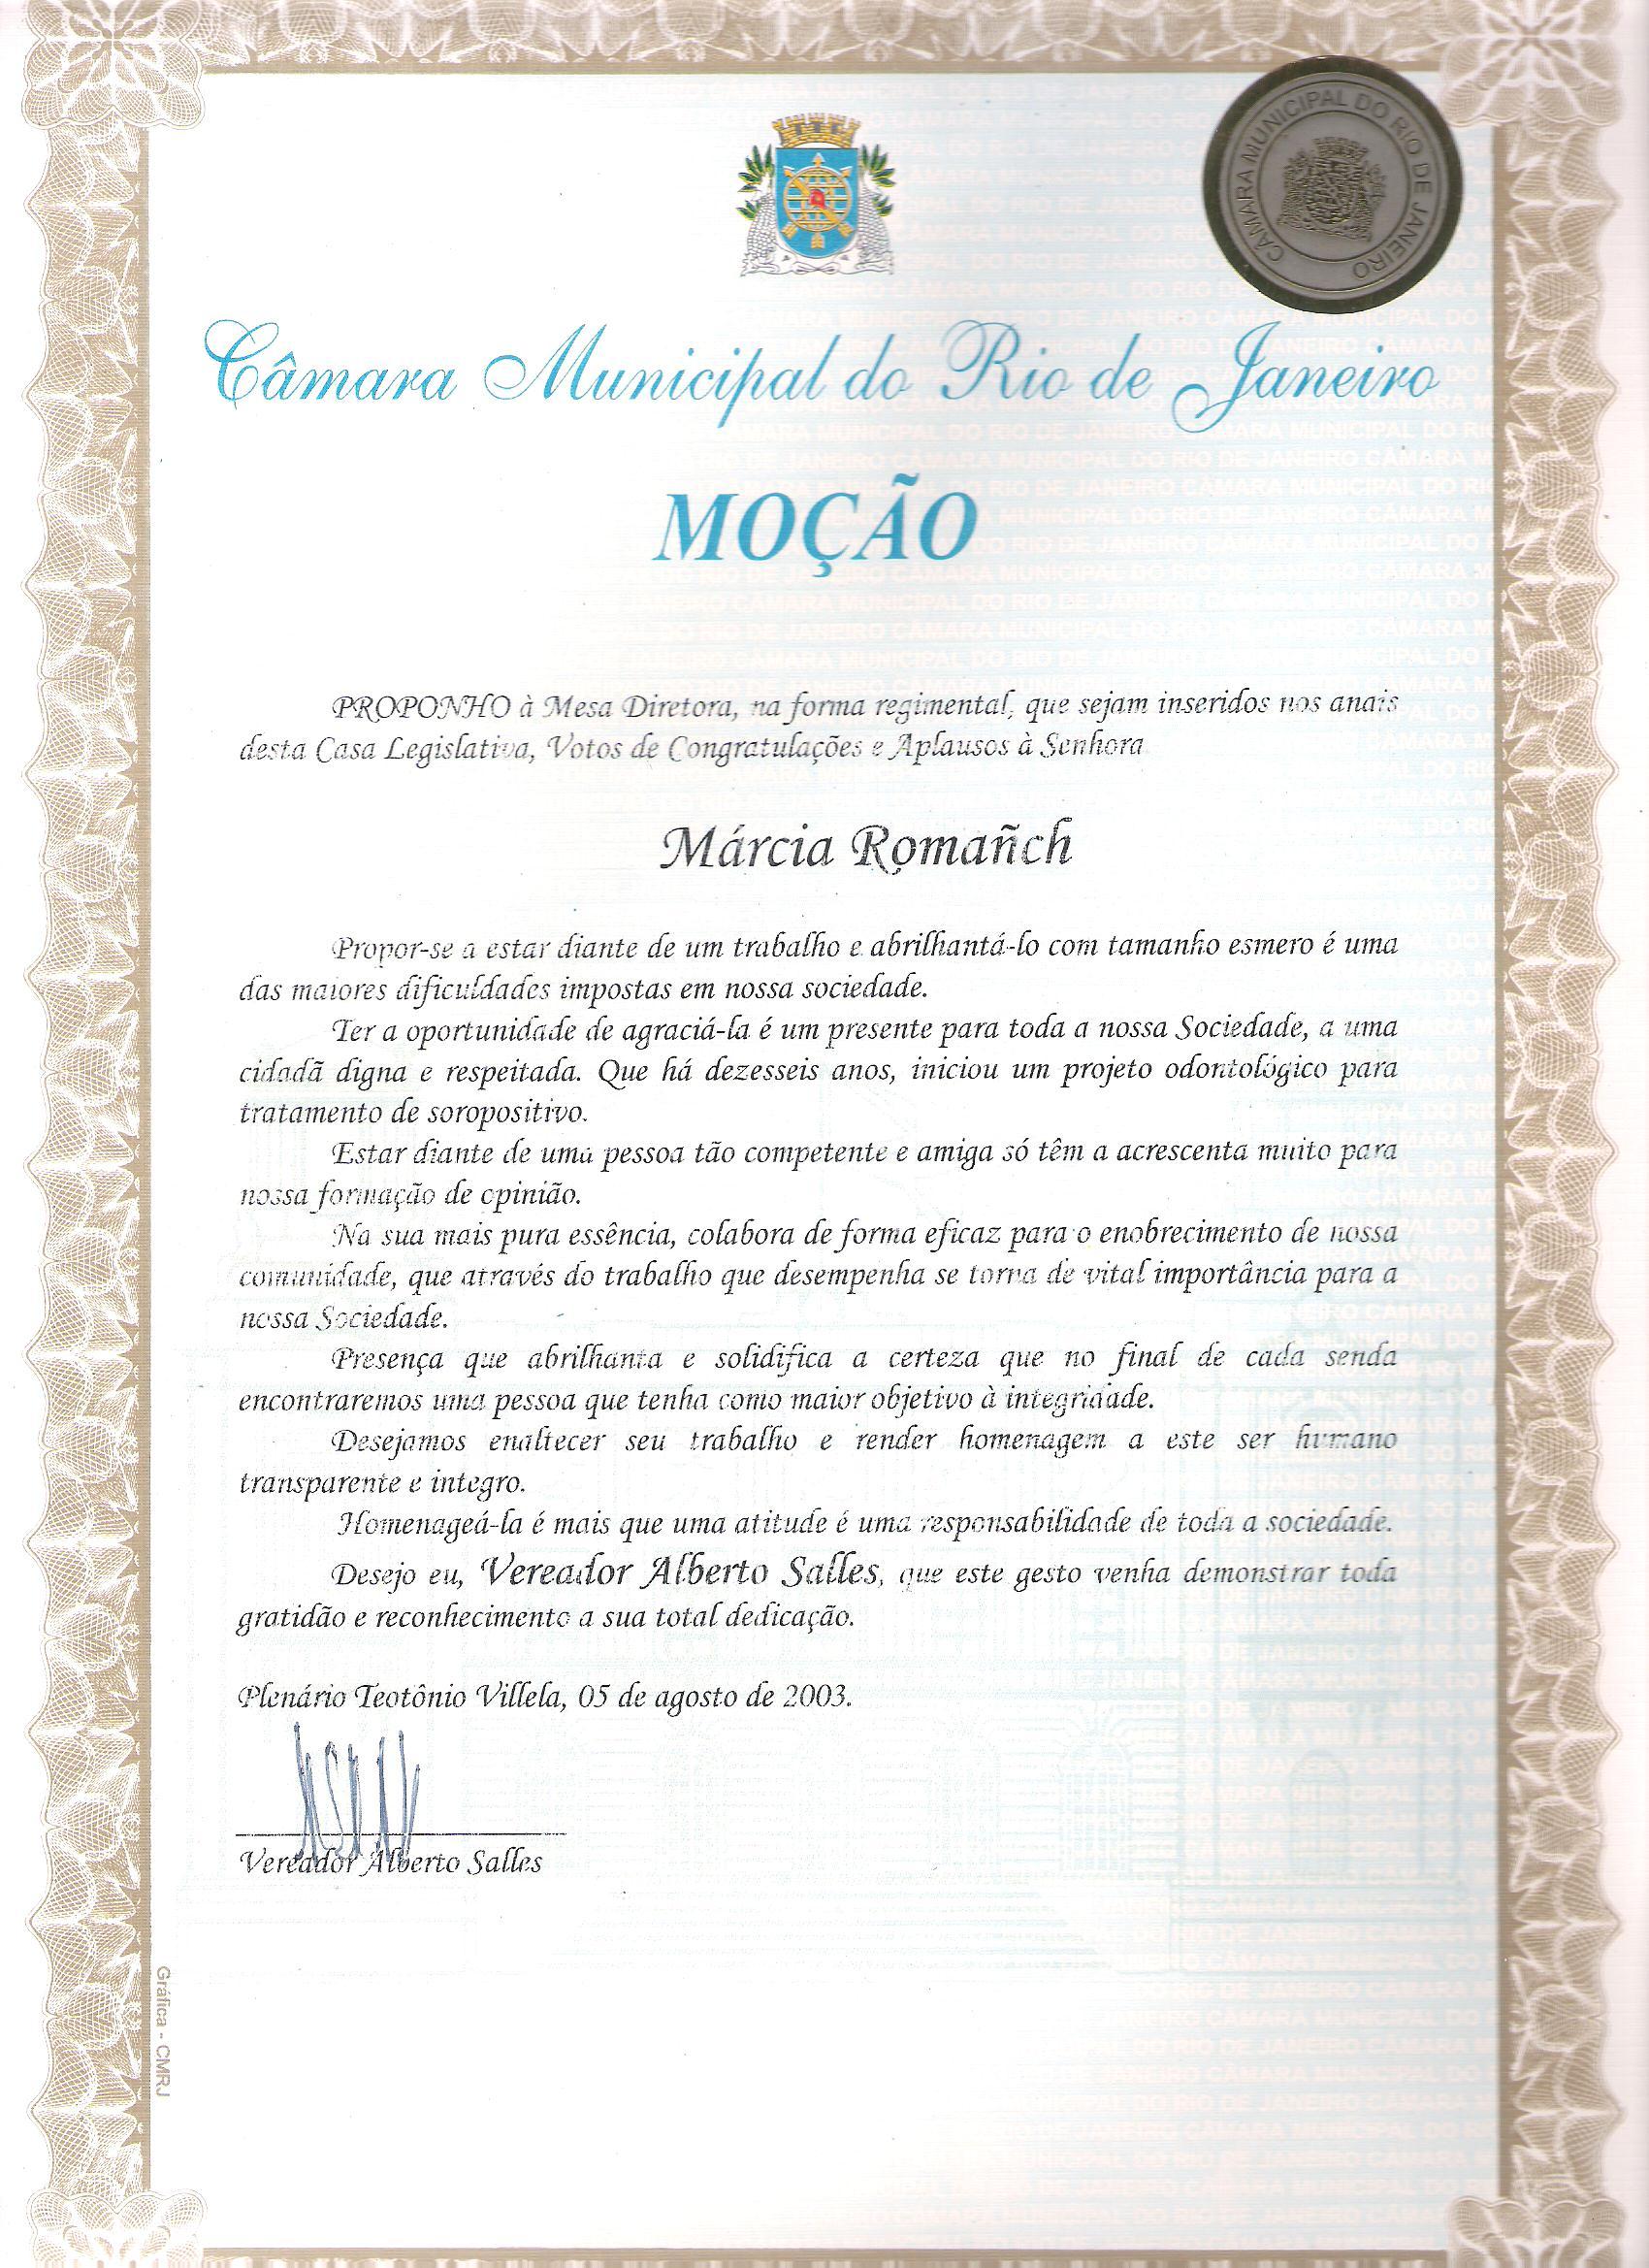 Moçao Camara